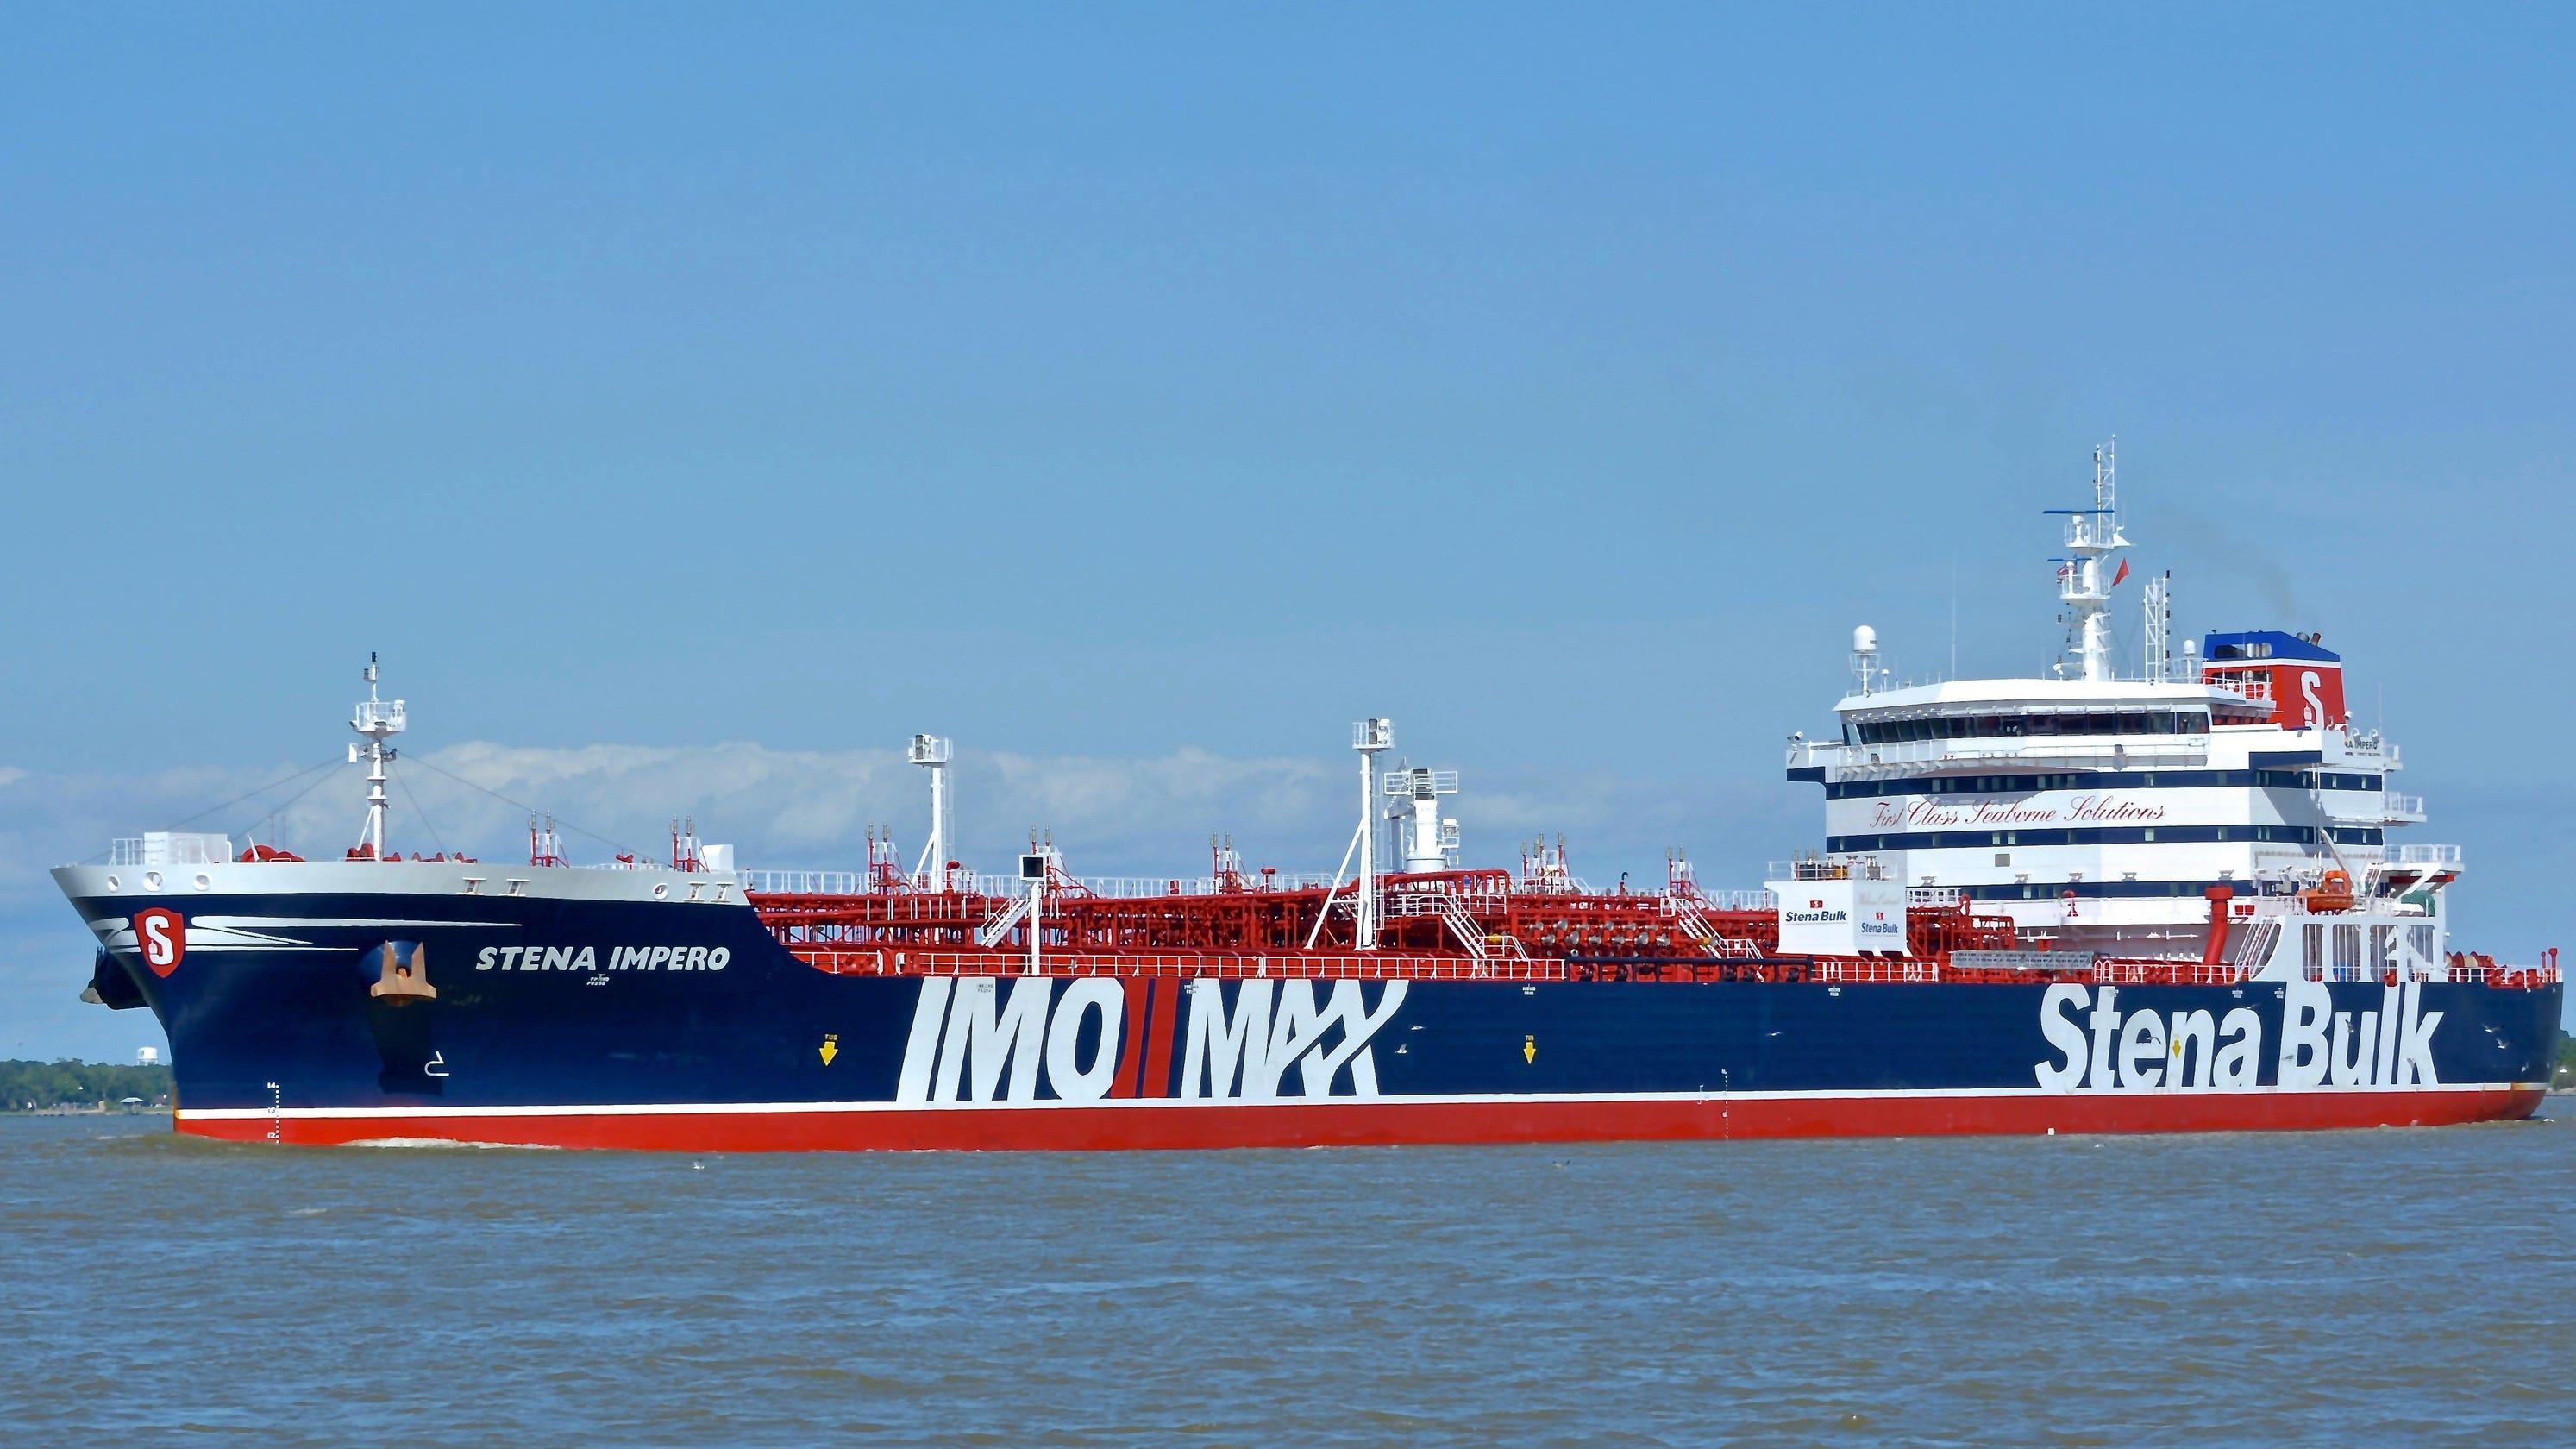 Iran's seizure of British oil tanker escalates tensions ...